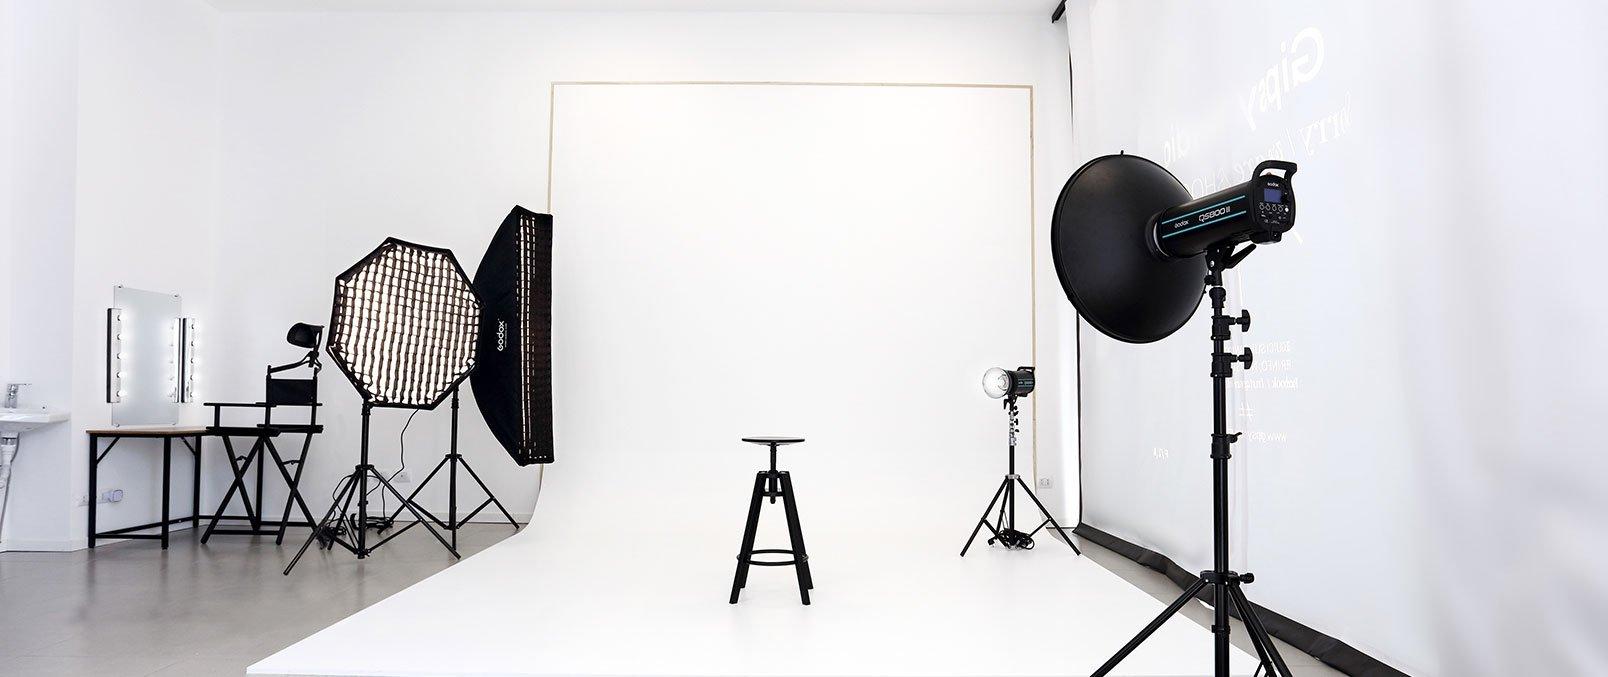 gipsy-studio-fotografico-milano-sala-posa